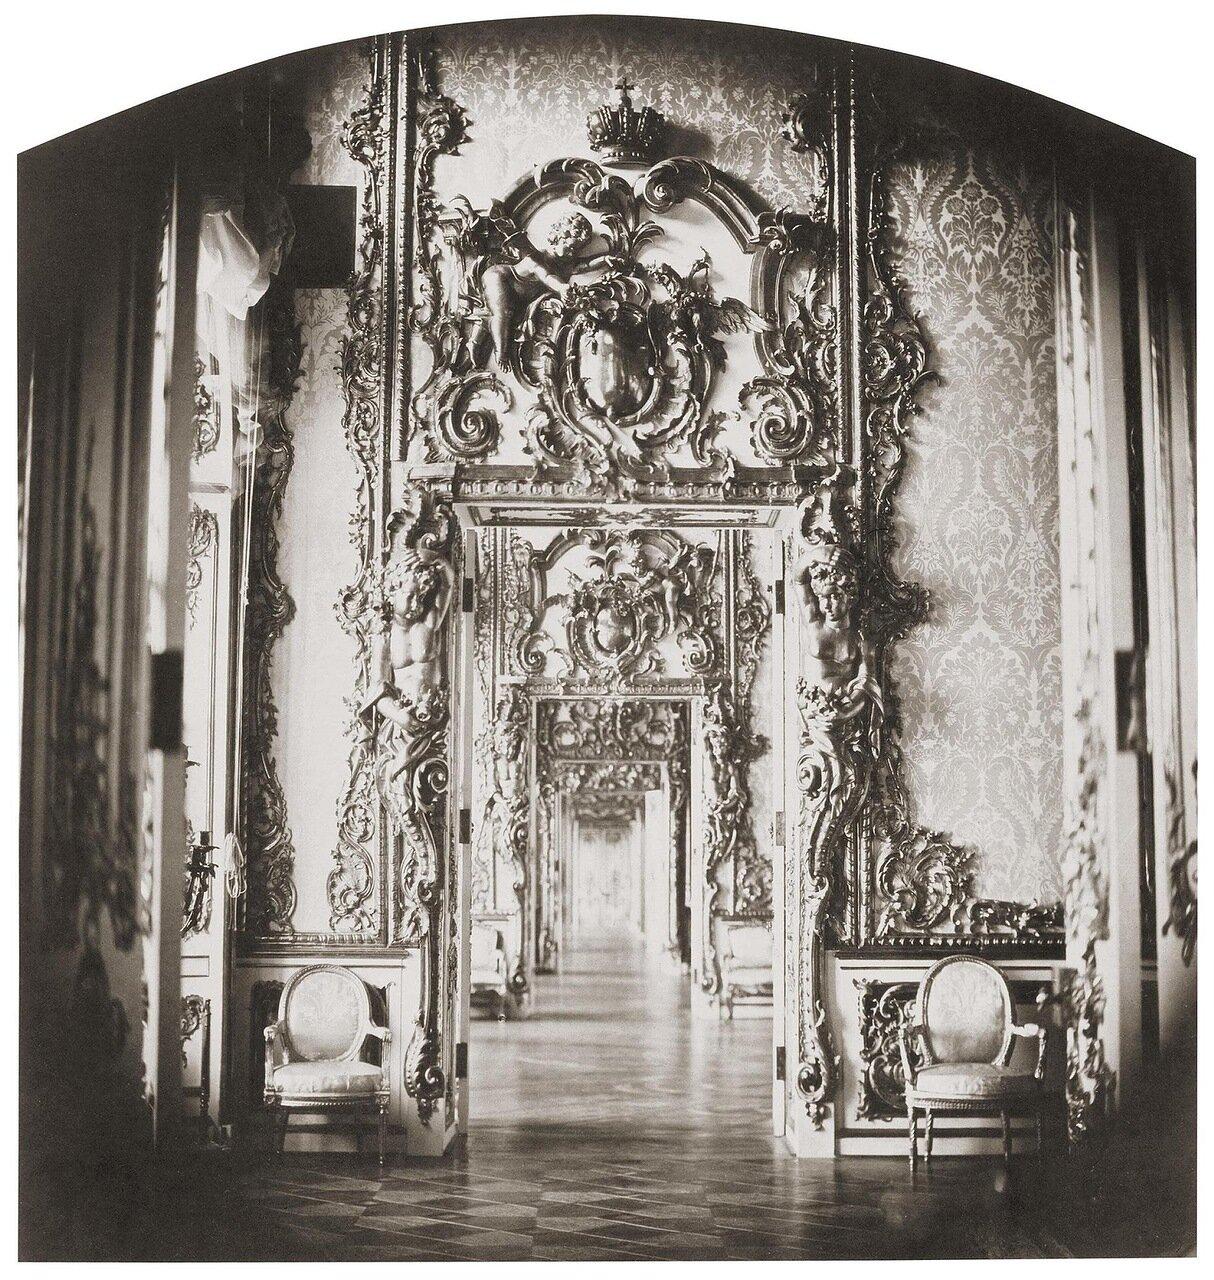 Анфилада зал в Екатерининском дворце. 1859